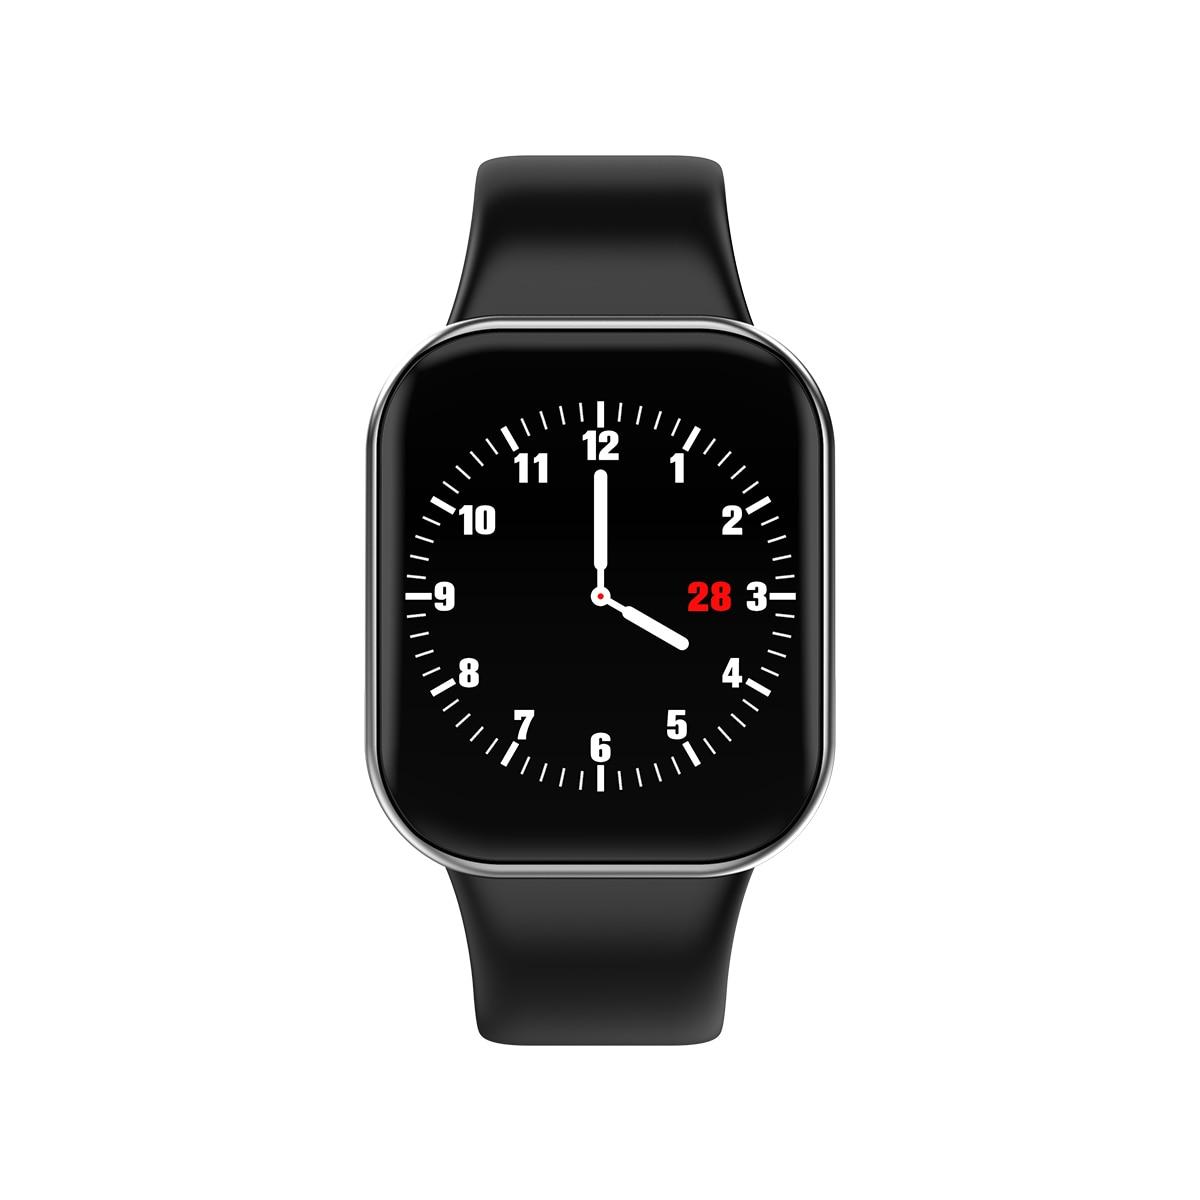 X16 Smart Watch Men Blood Pressure Waterproof Smartwatch Women Heart Rate Monitor Fitness Tracker Watch Sport For Android IOS